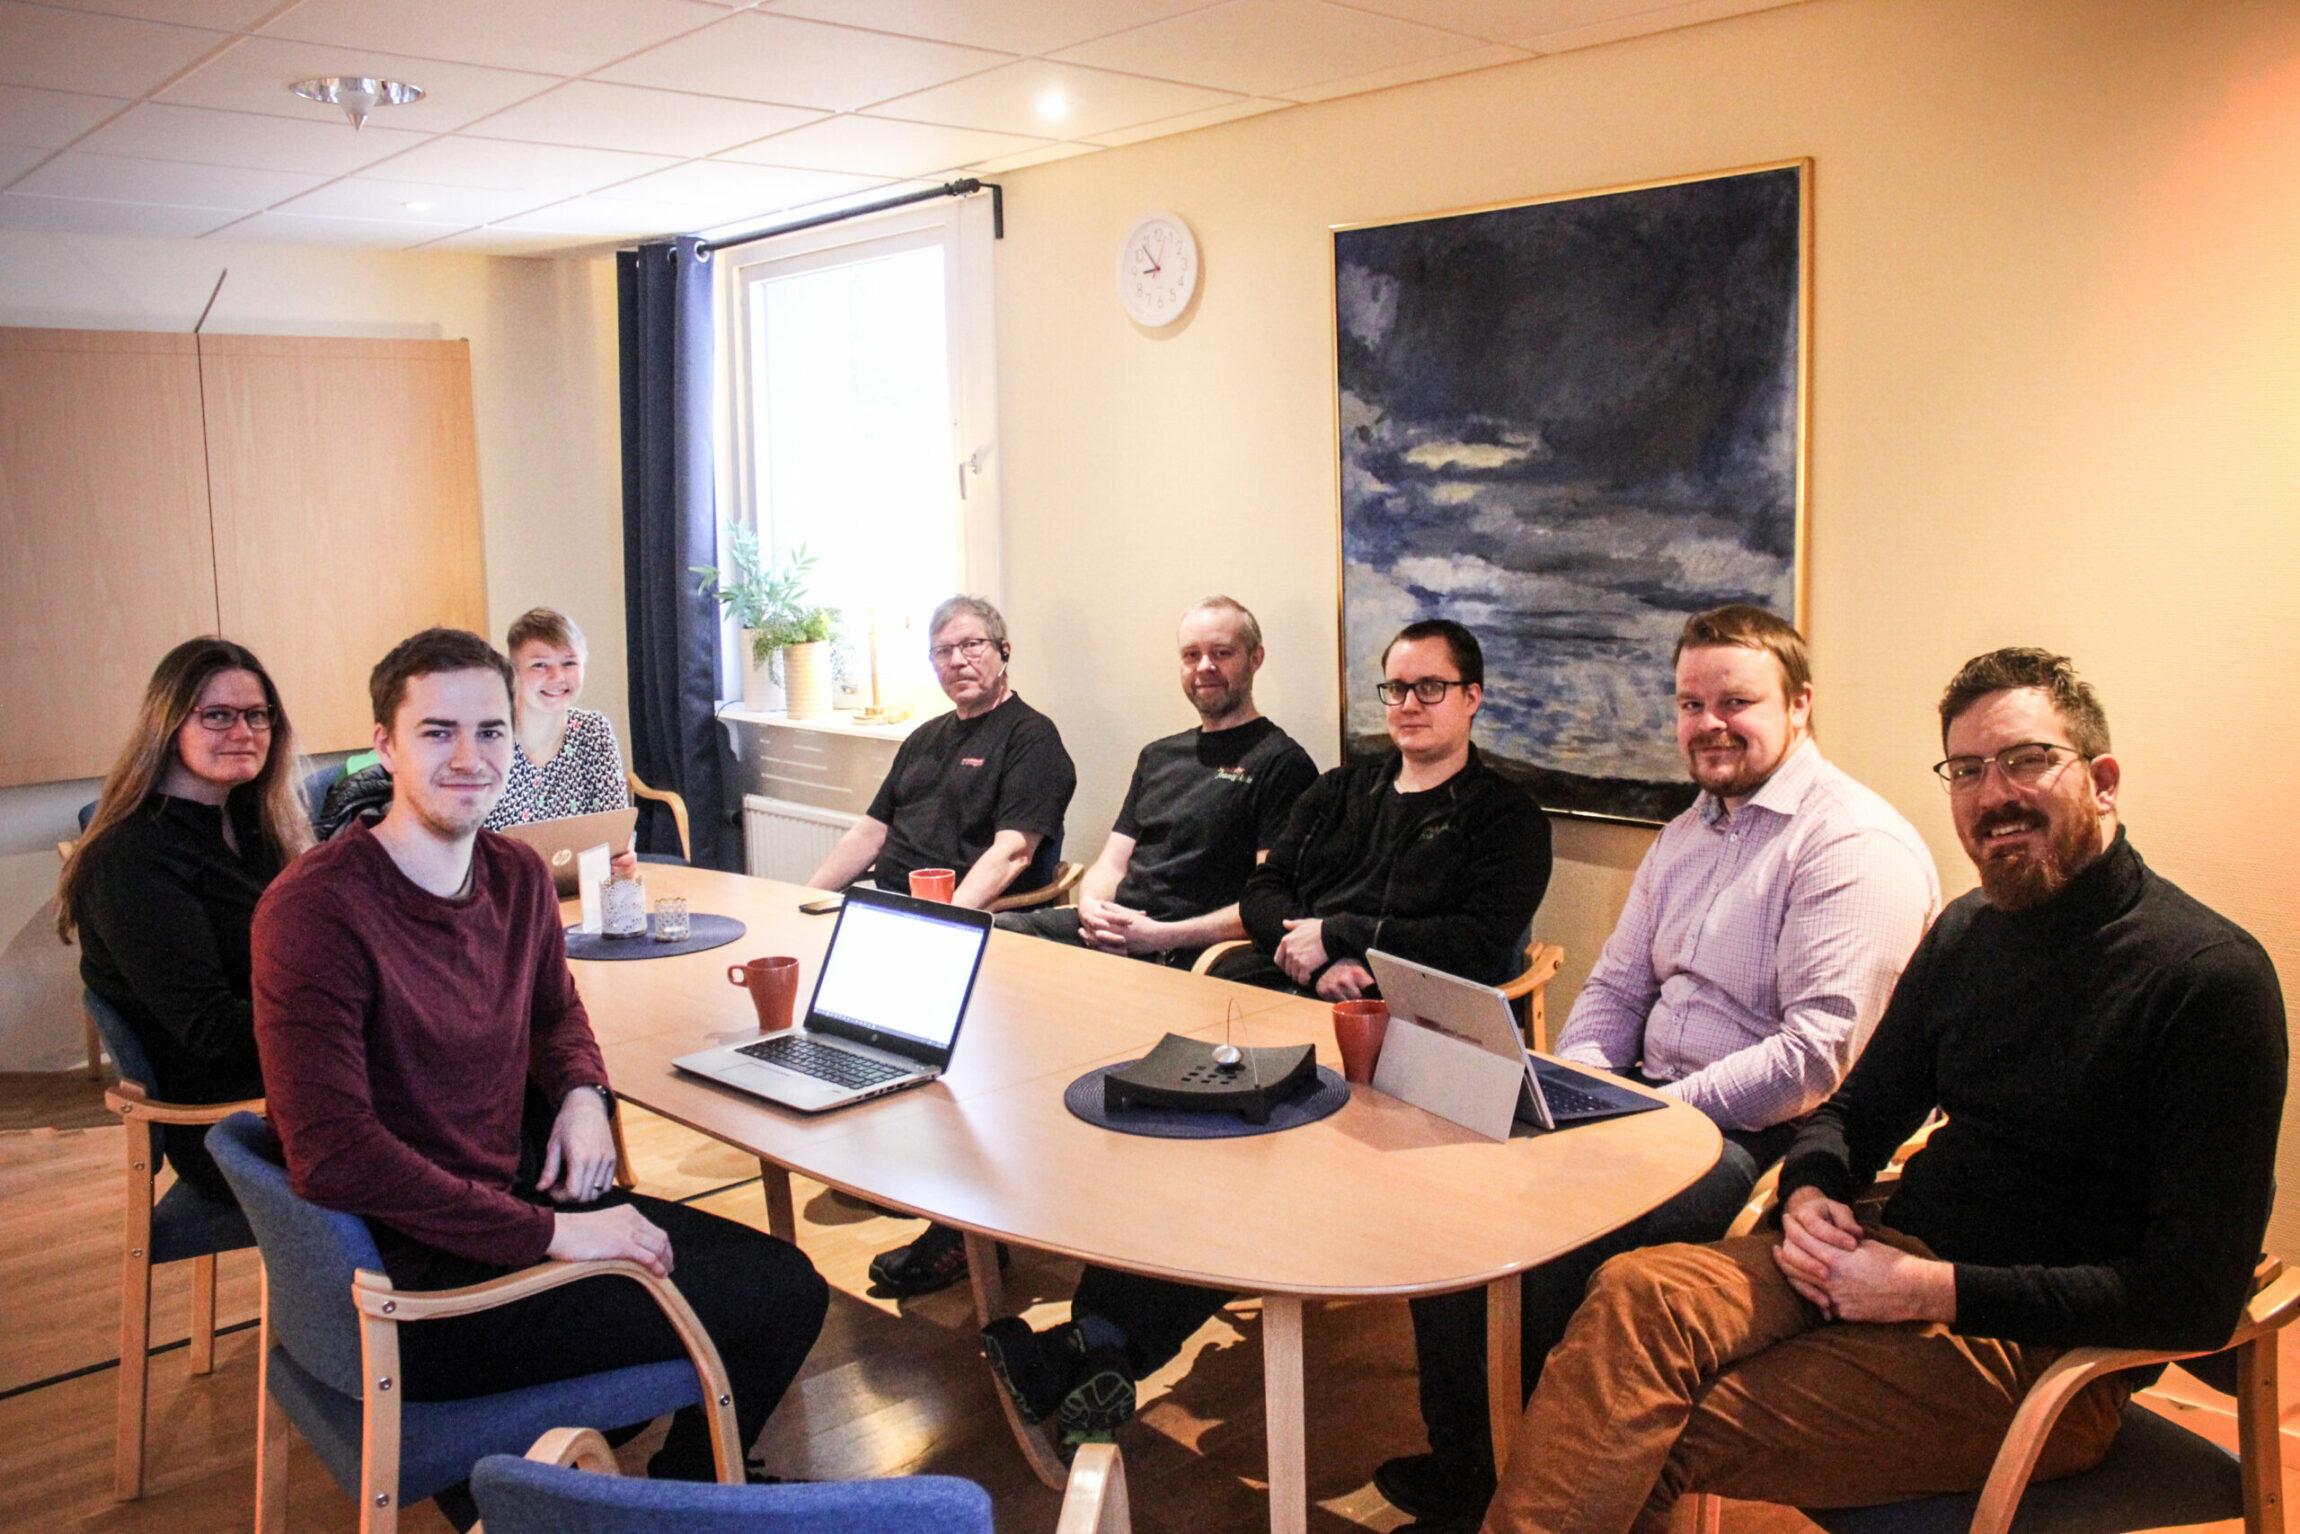 Collaboration between stakeholders can boost energy efficiency in buildings